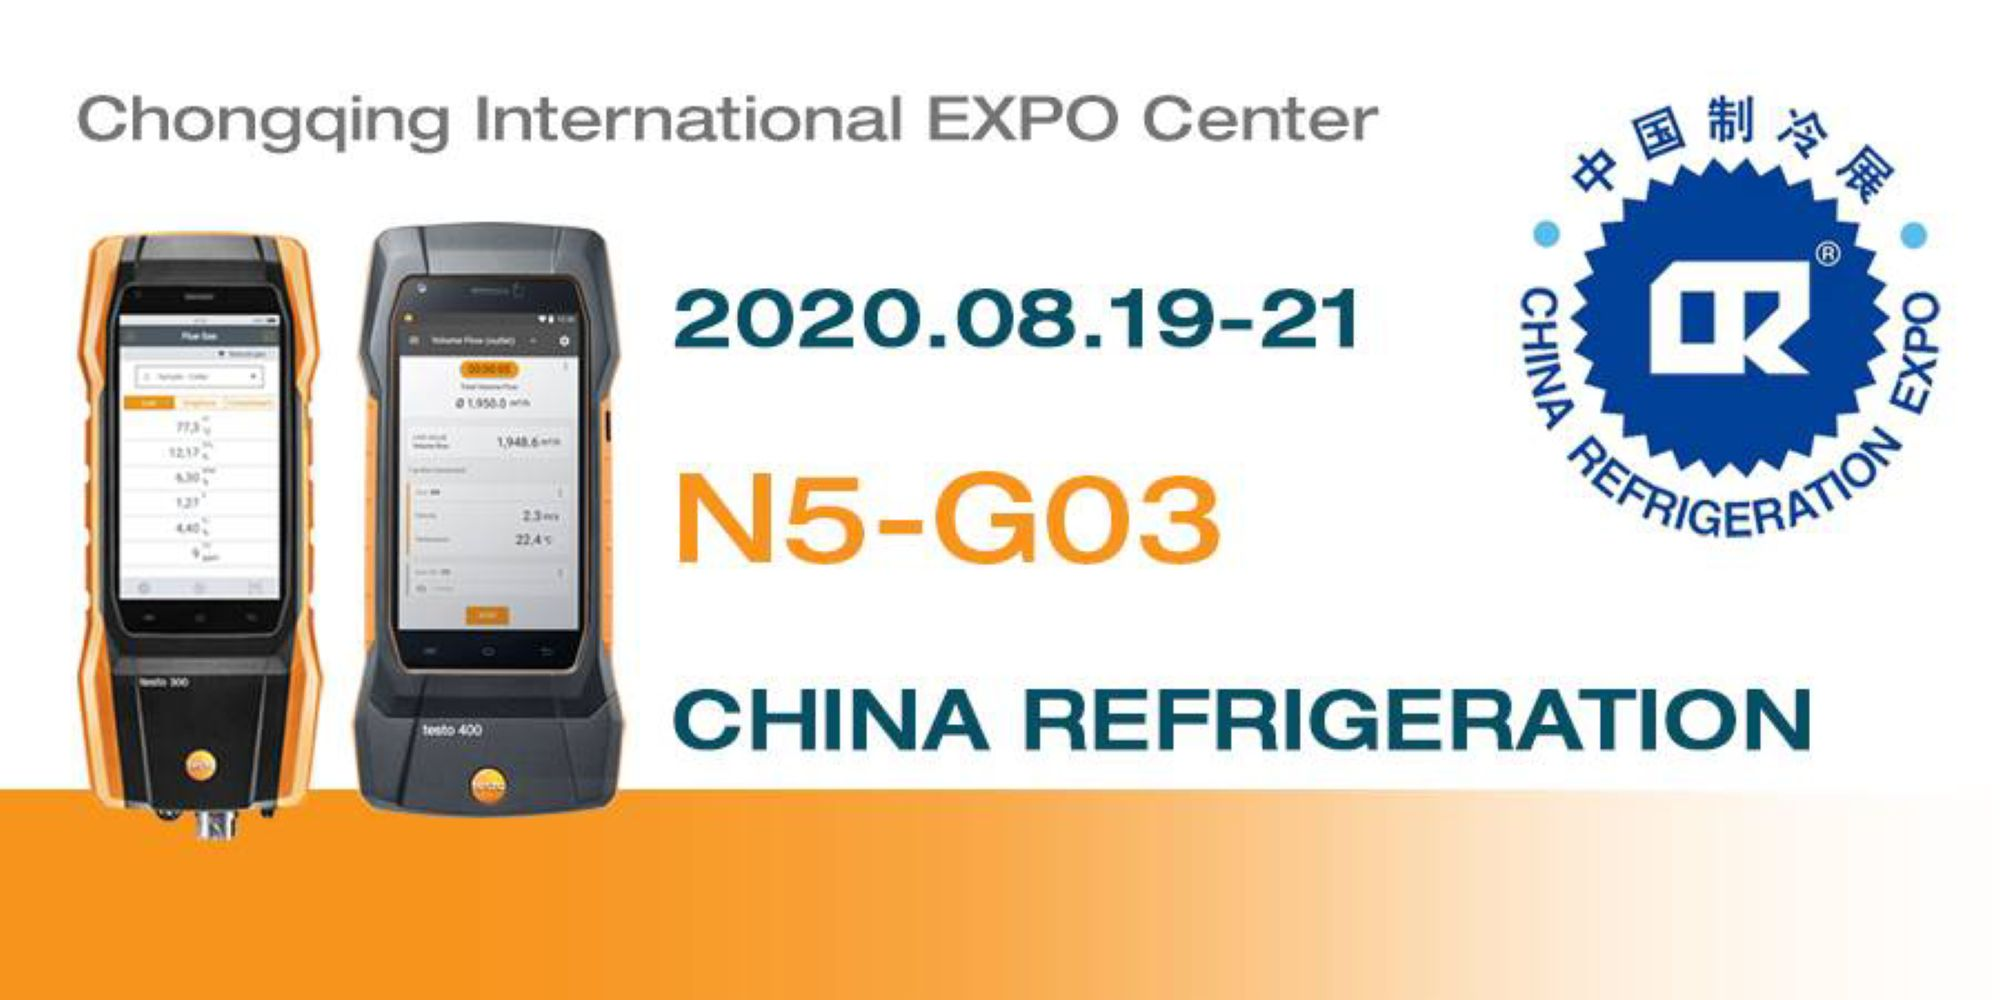 CN_20200529_CRH_tradeshow-900x450.jpg